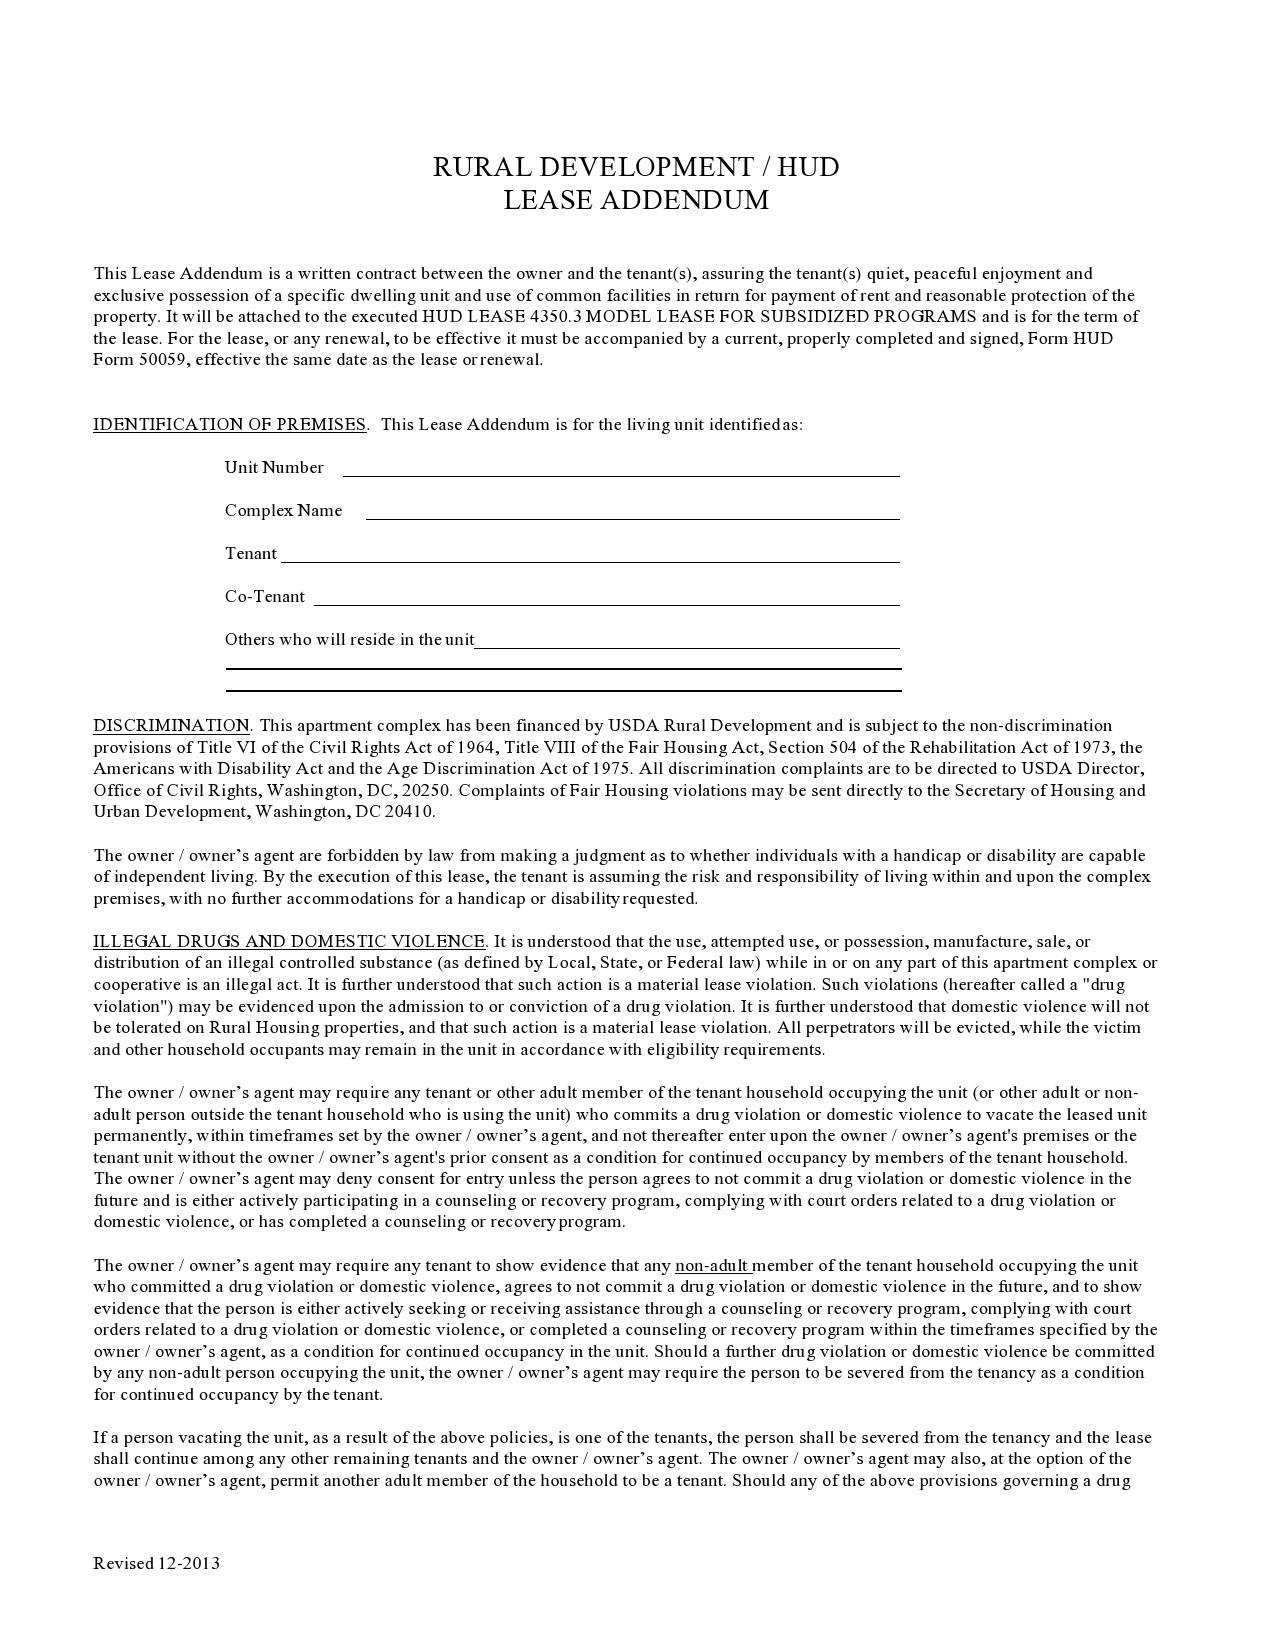 Free lease extension addendum 35